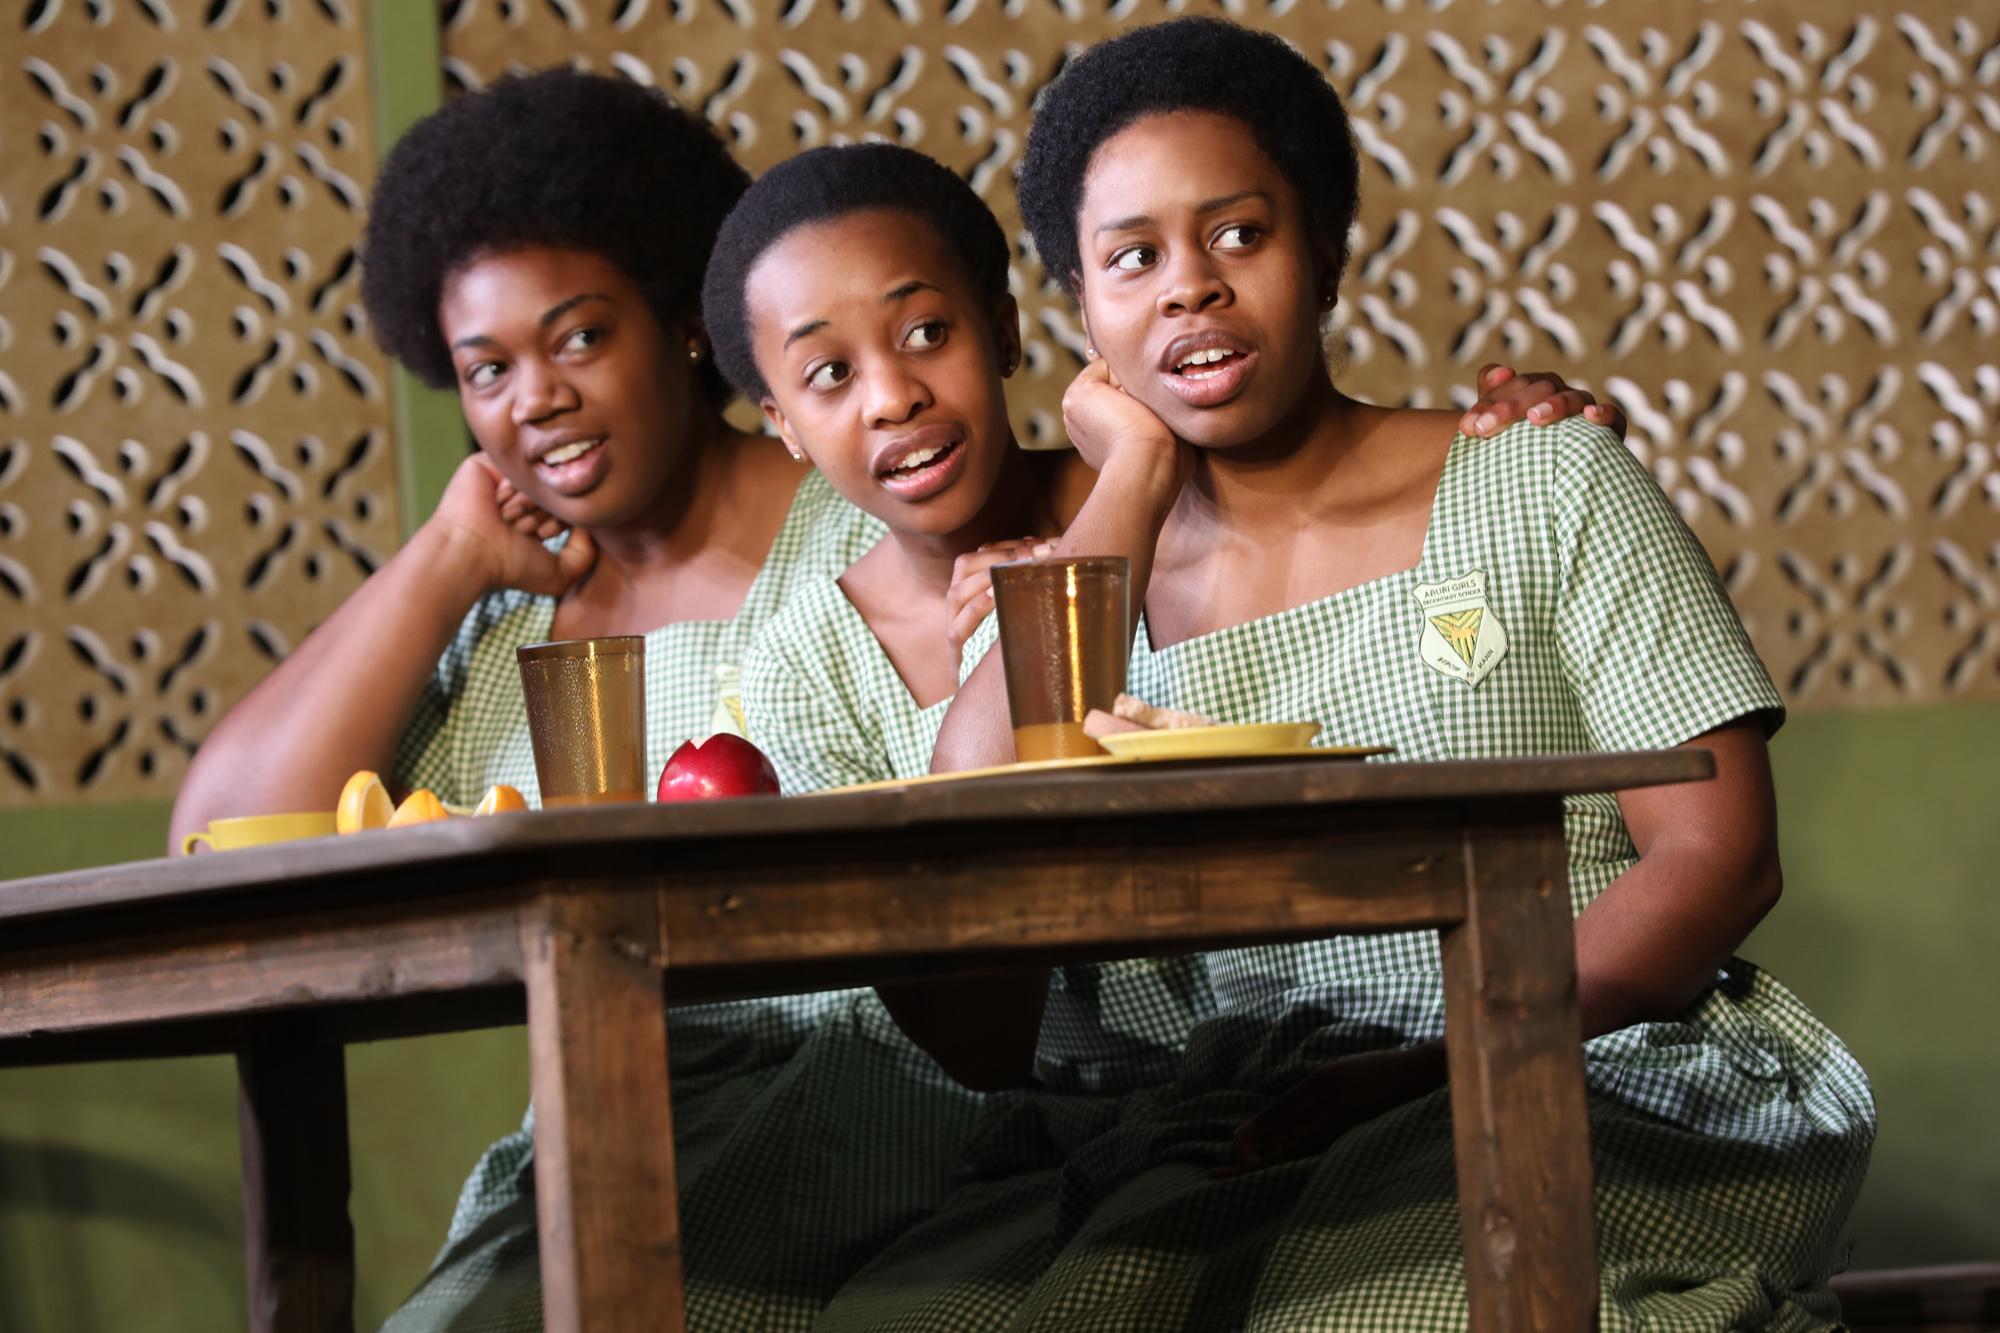 Abena Mensah-Bonsu, Mirirai-Sithole, and Paige Gilbert. Photo Credit: Joan Marcus.